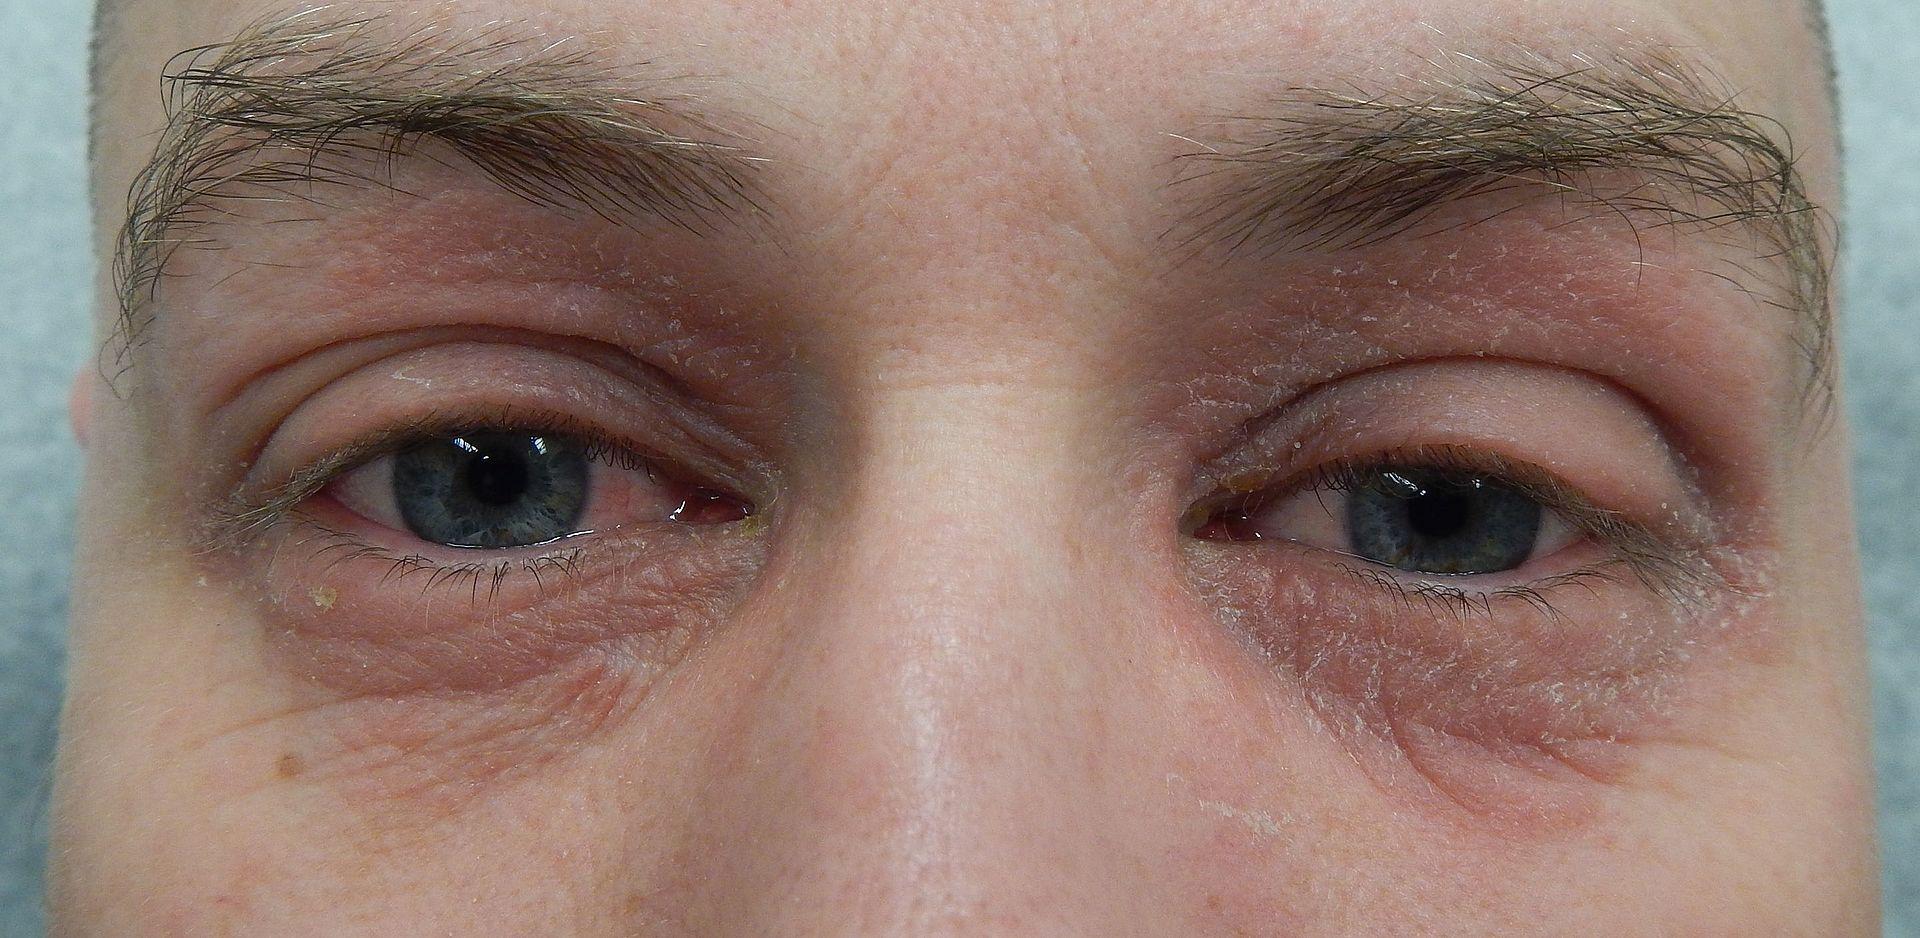 Skin Irritation Under Ring